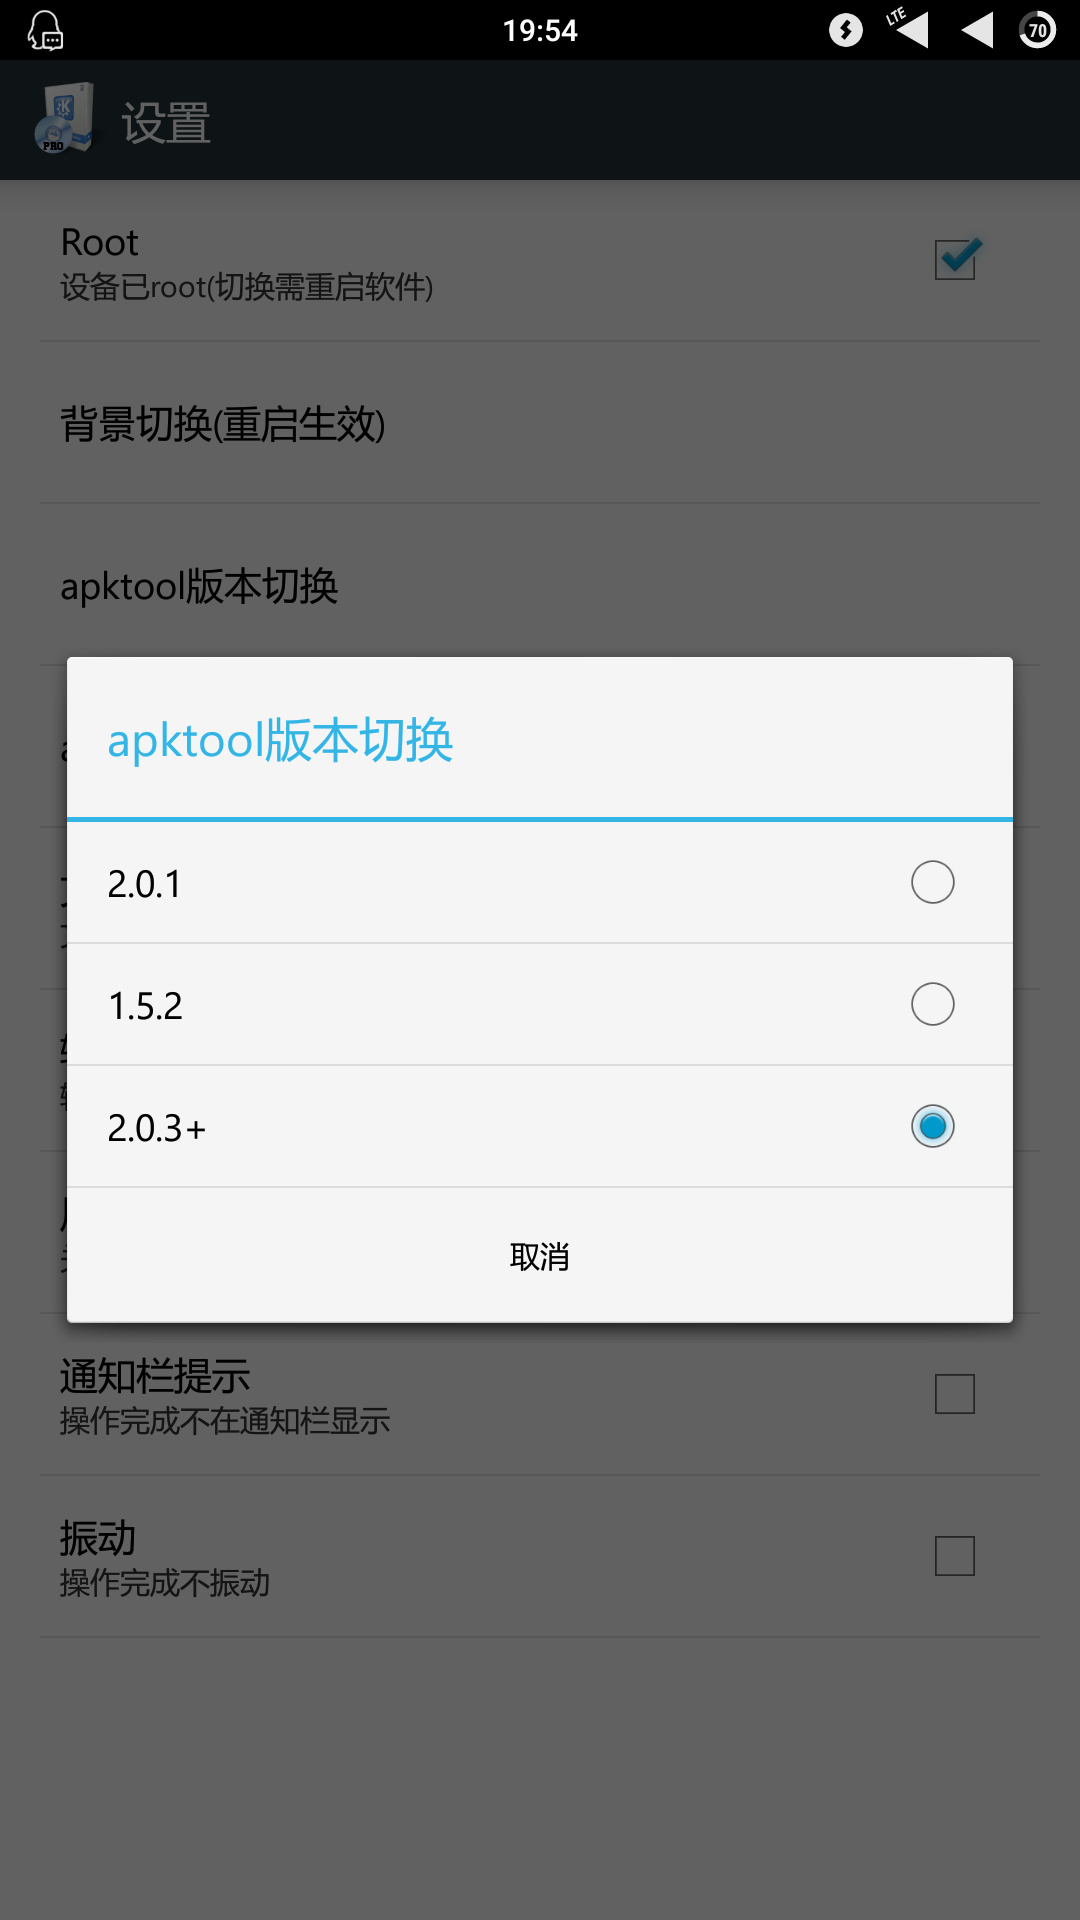 Screenshot_20160605-195426.png